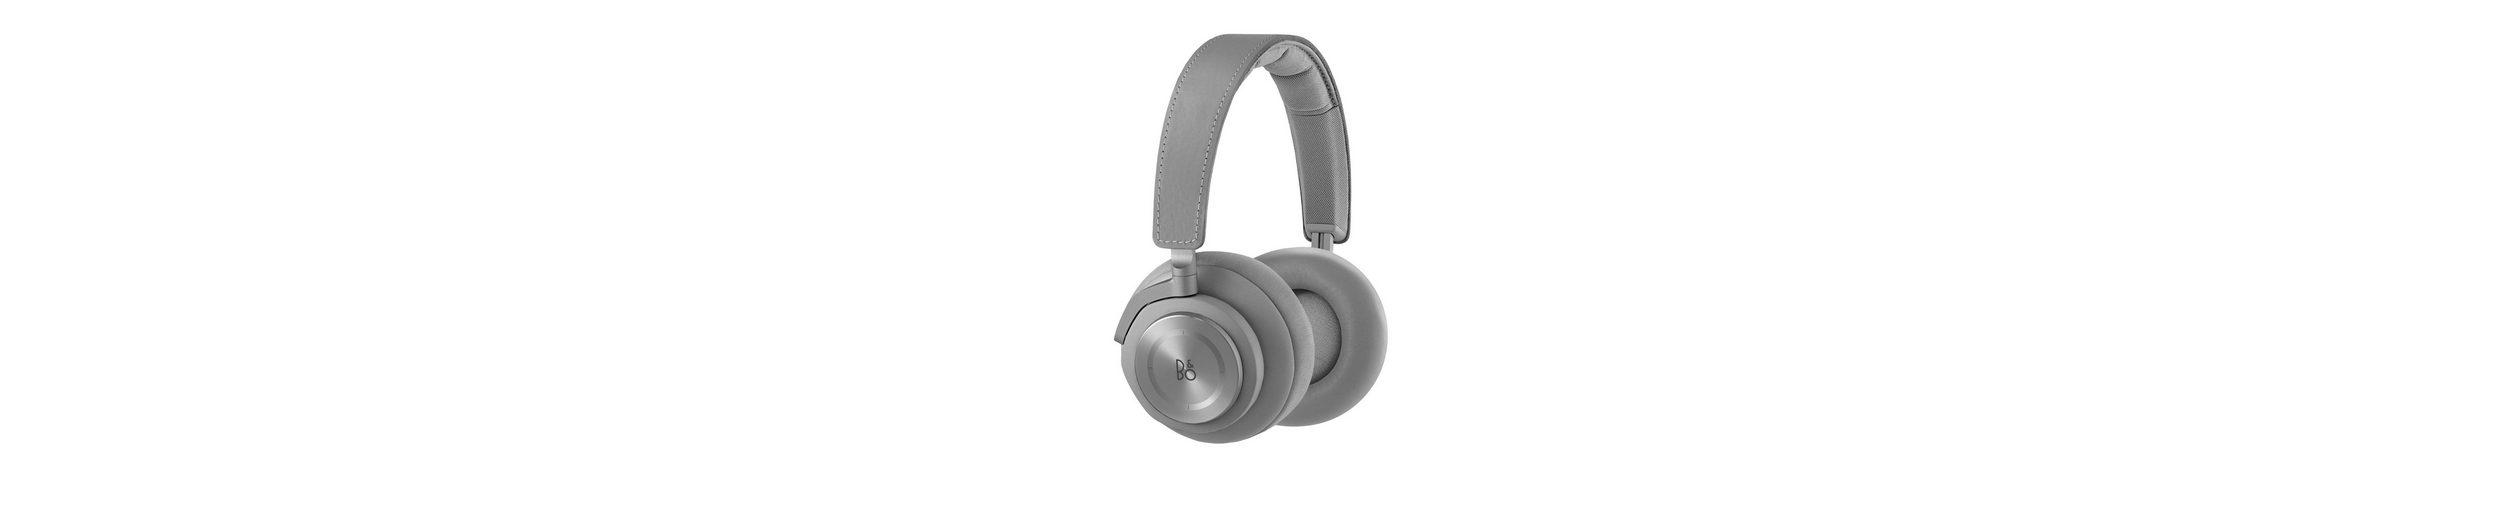 B&O-Play Bluetooth Over-Ear Kopfhörer »BeoPlay H7«